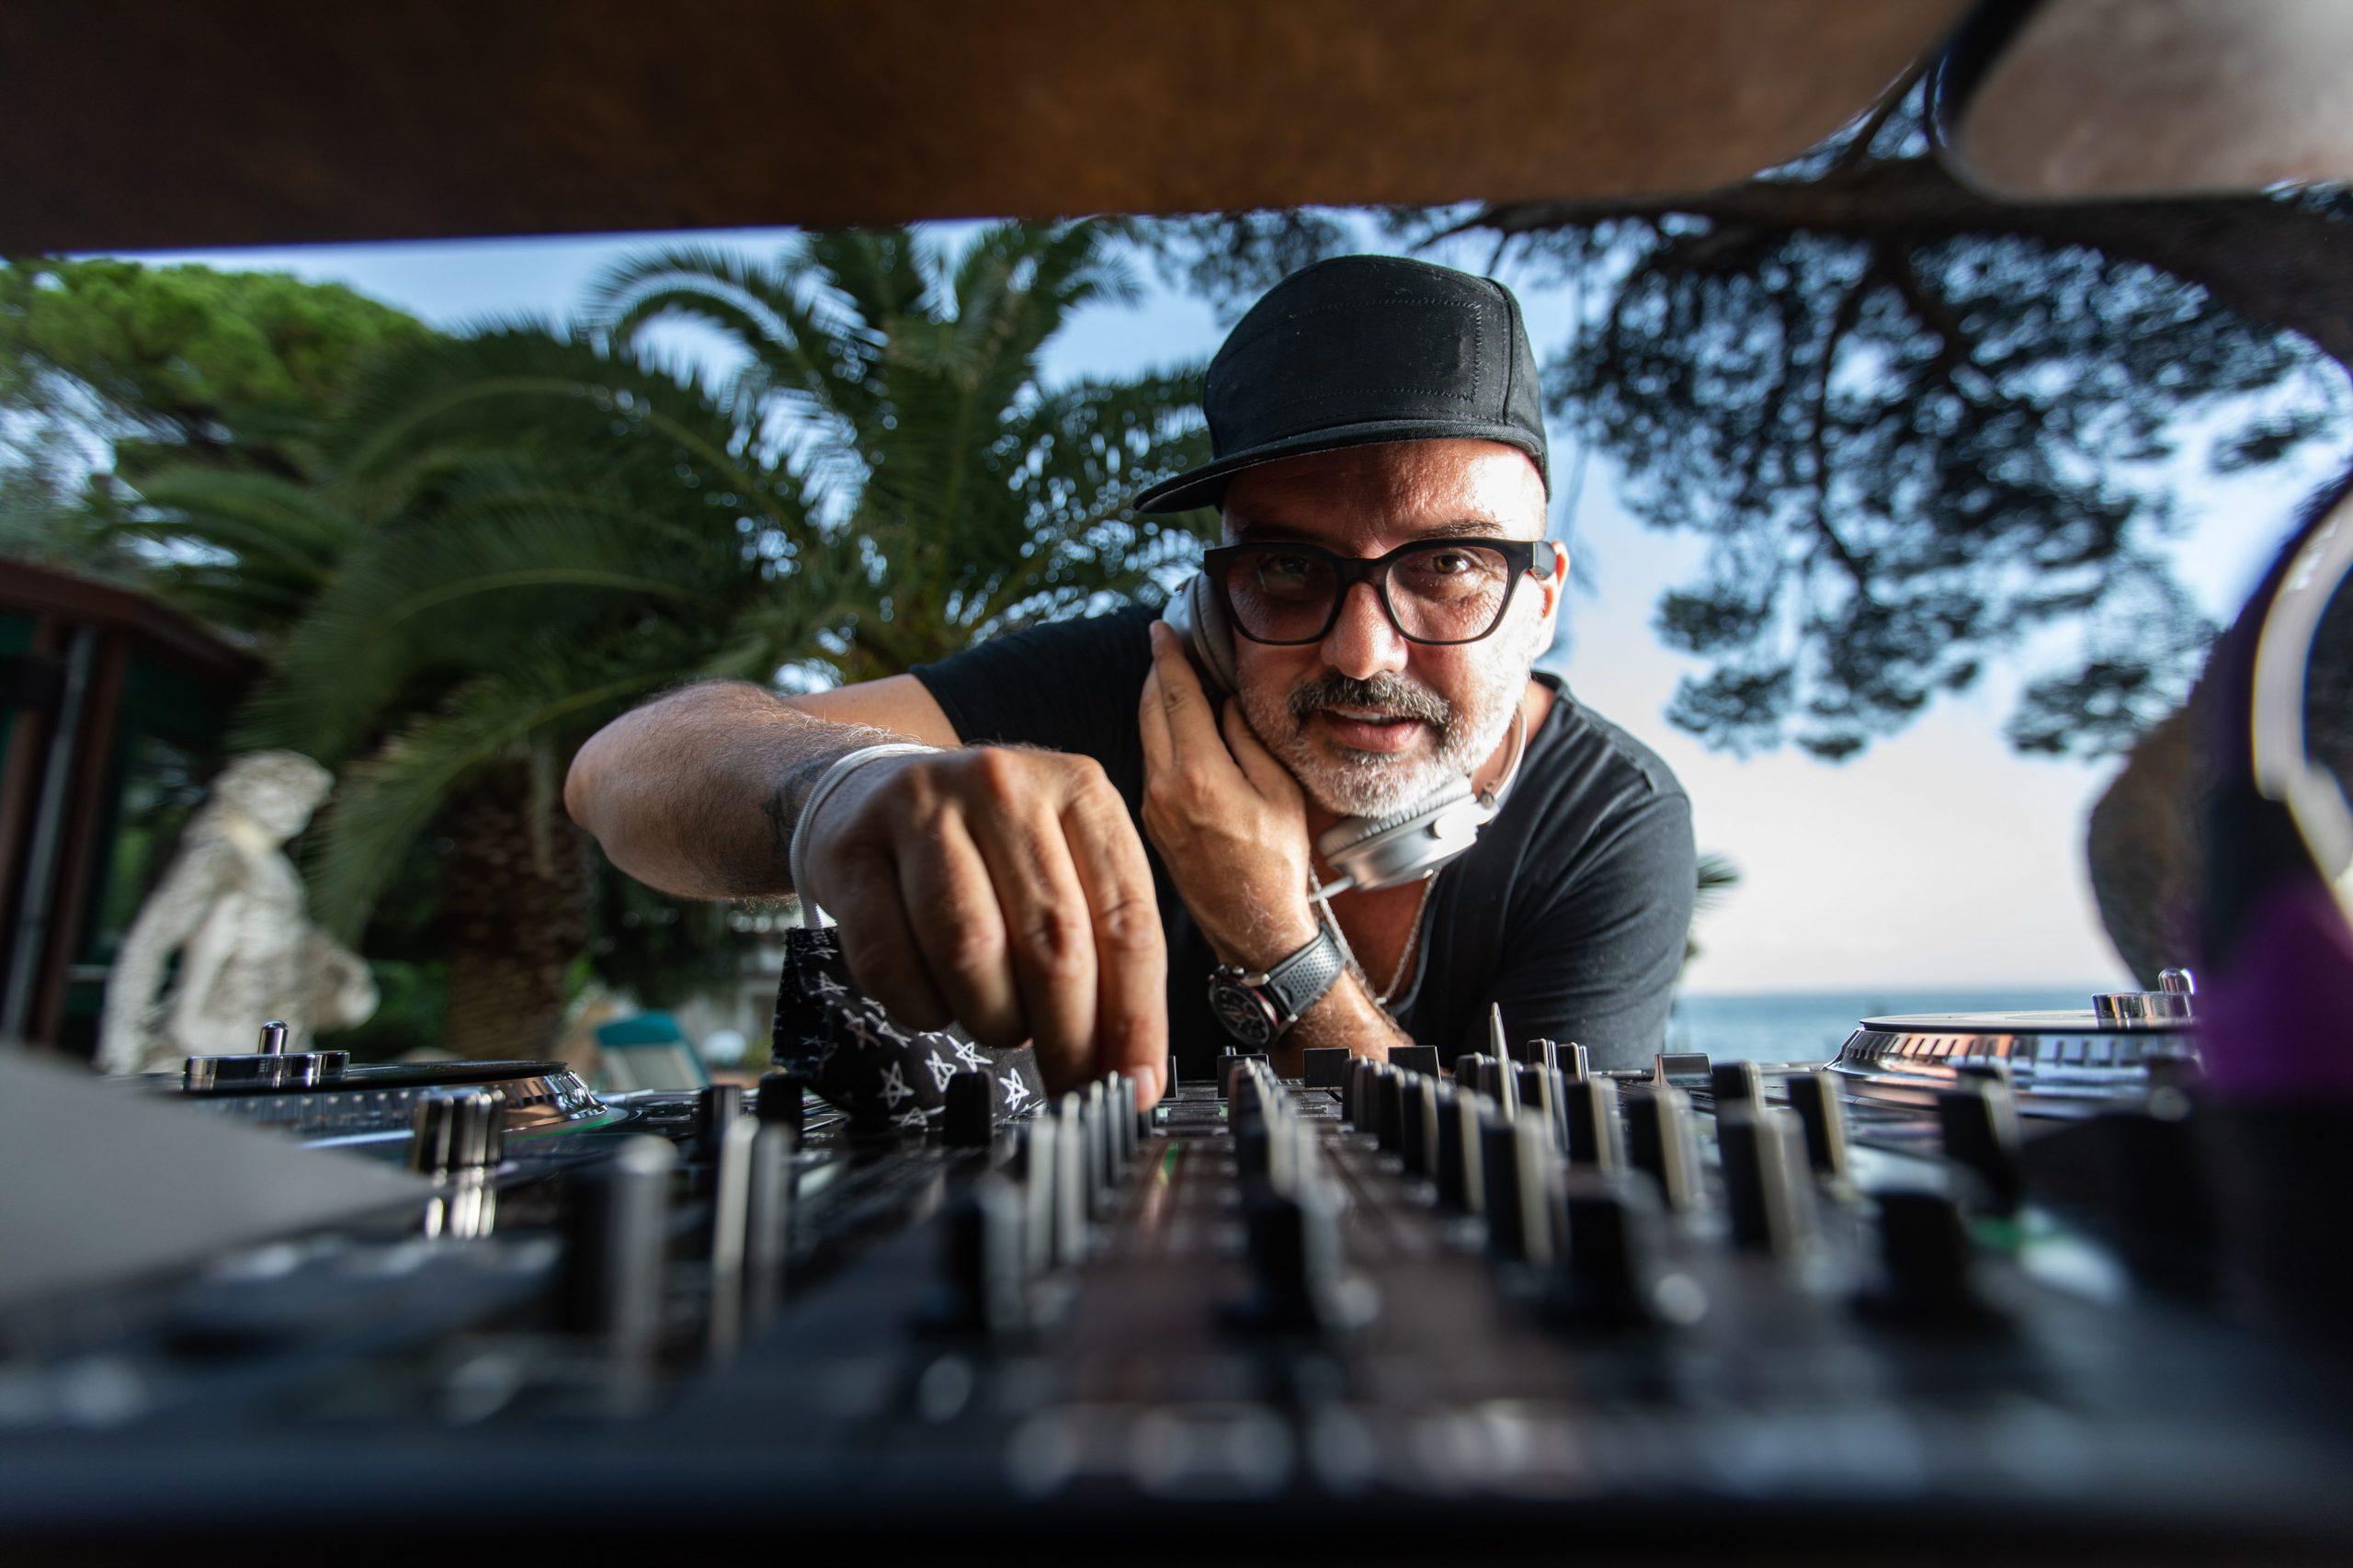 Opatija, 08.08.2020 – Tony Cetinski ima DJ nastup na terasi hotela Milenij